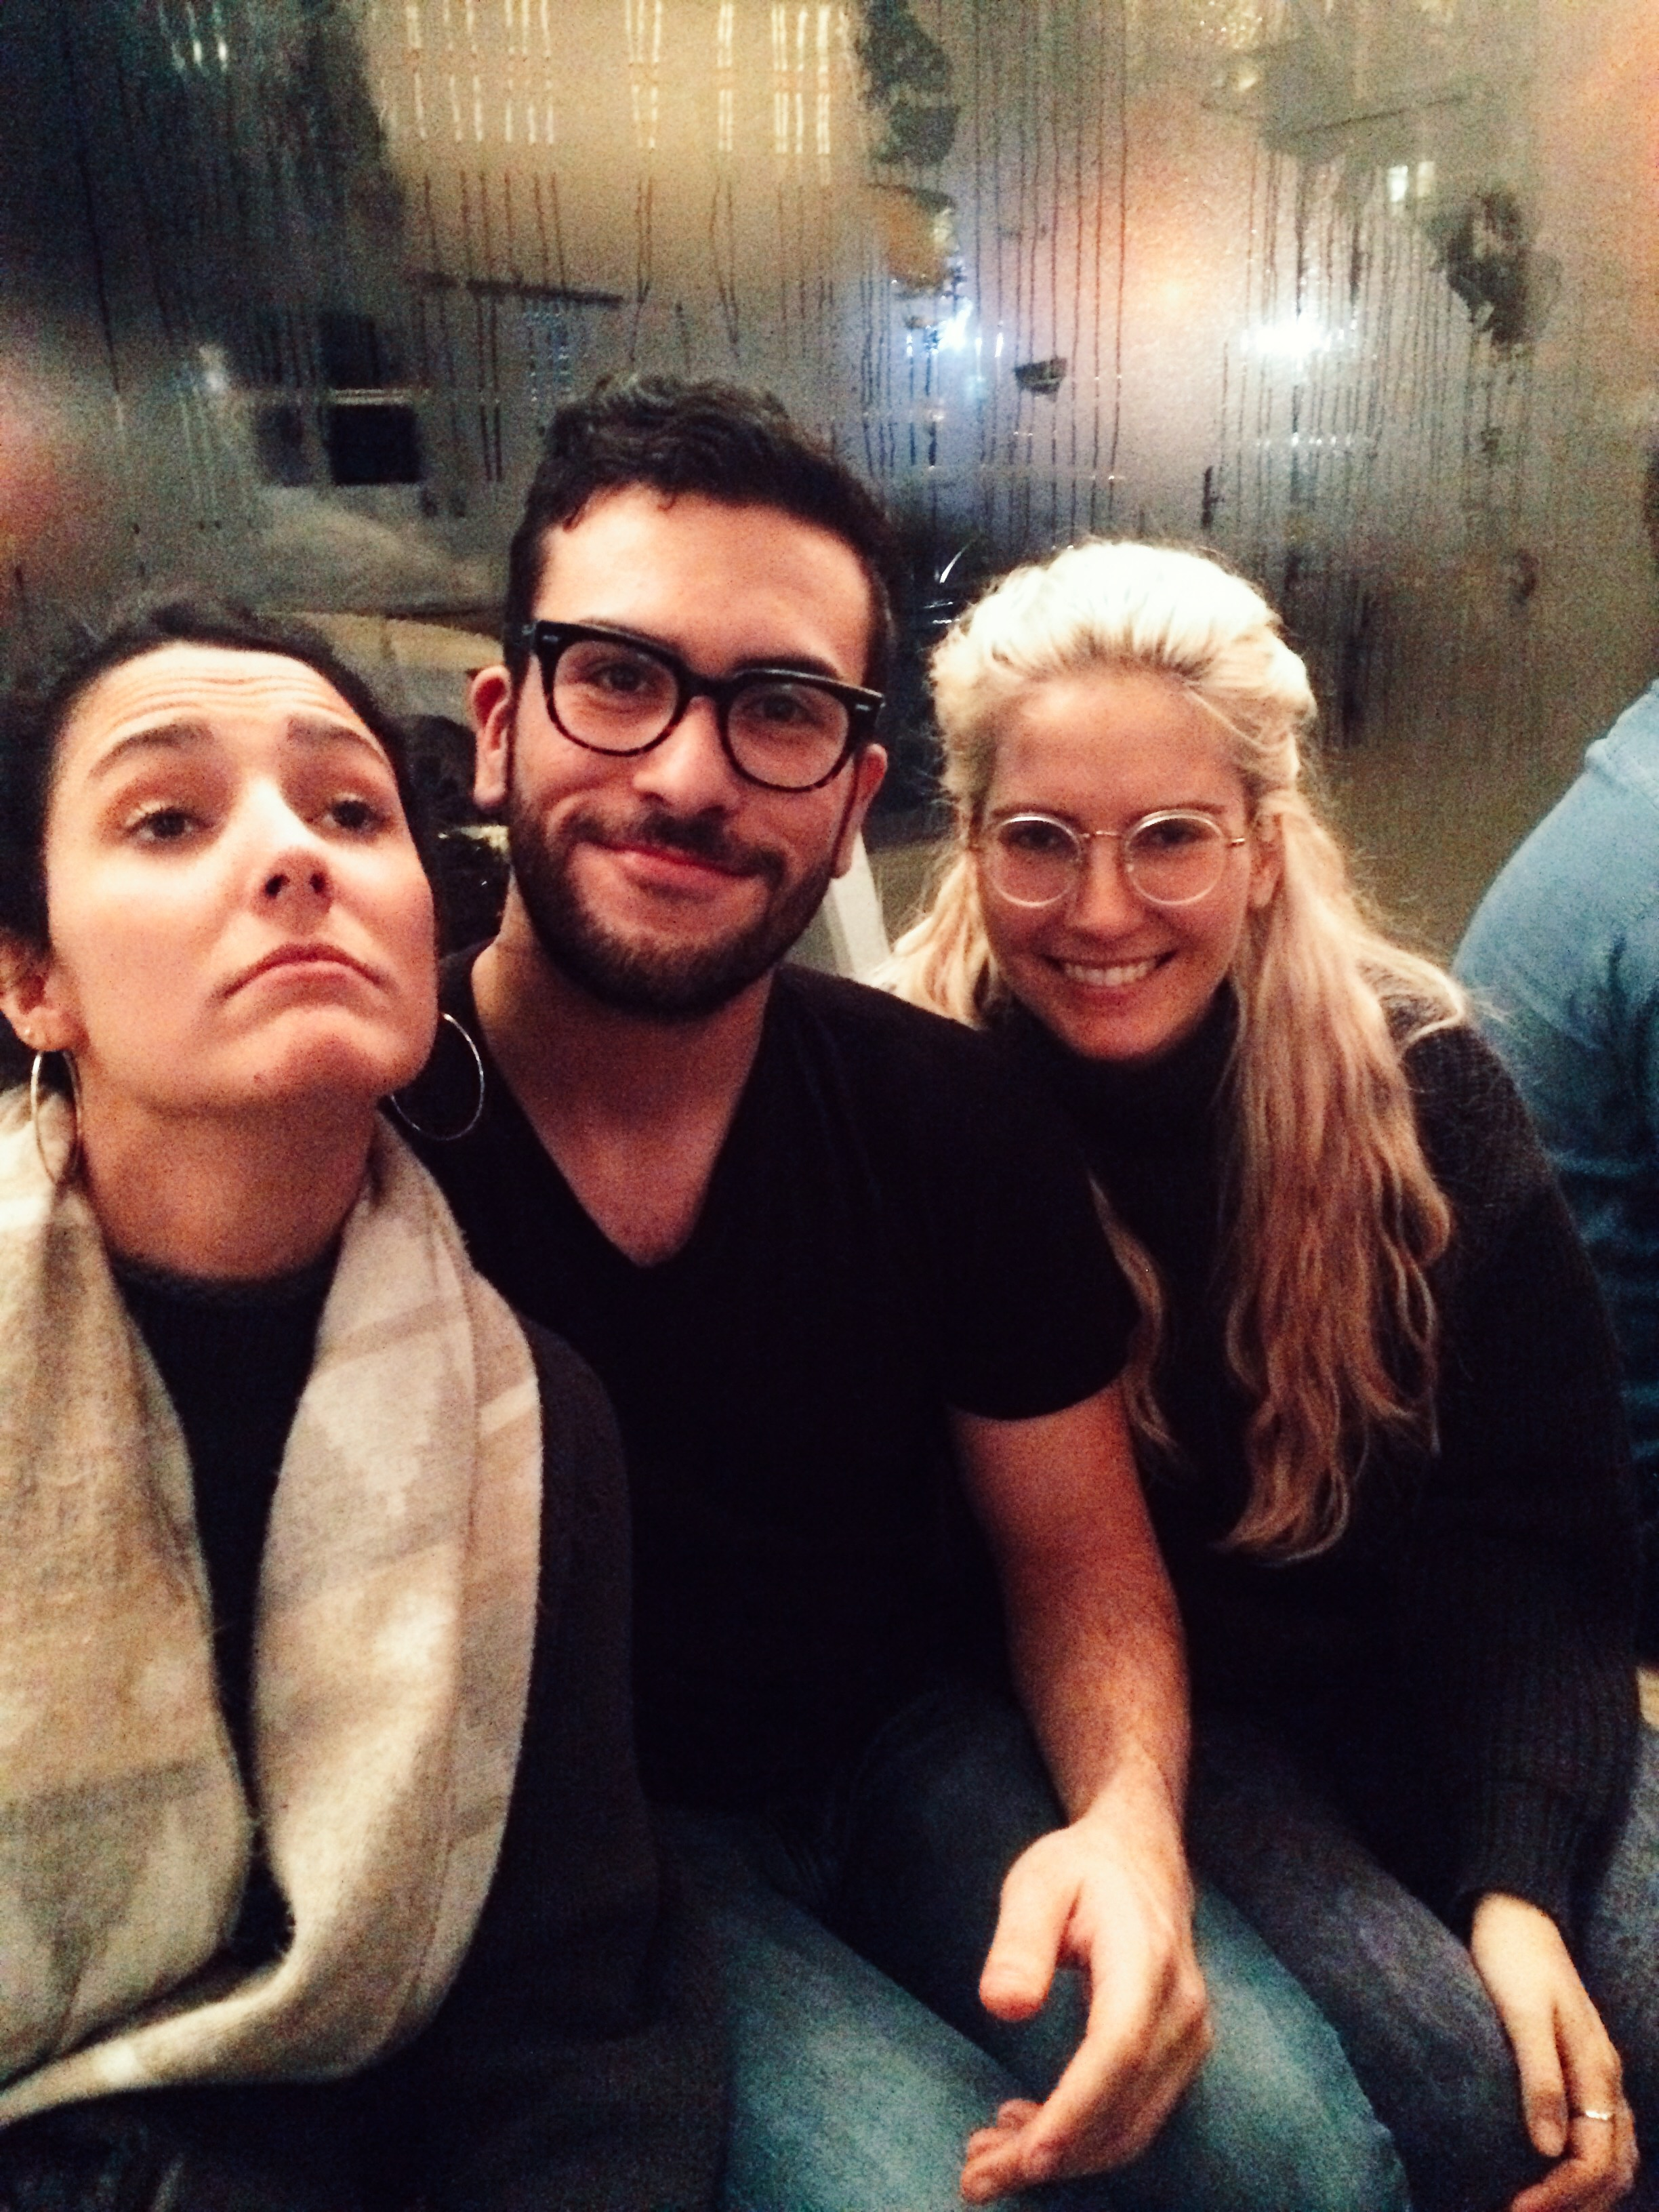 Viki Sanz, recent interviewee, Francisco M á rquez, assistant interviews editor, and Alisha Kaplan co- pr & web editor